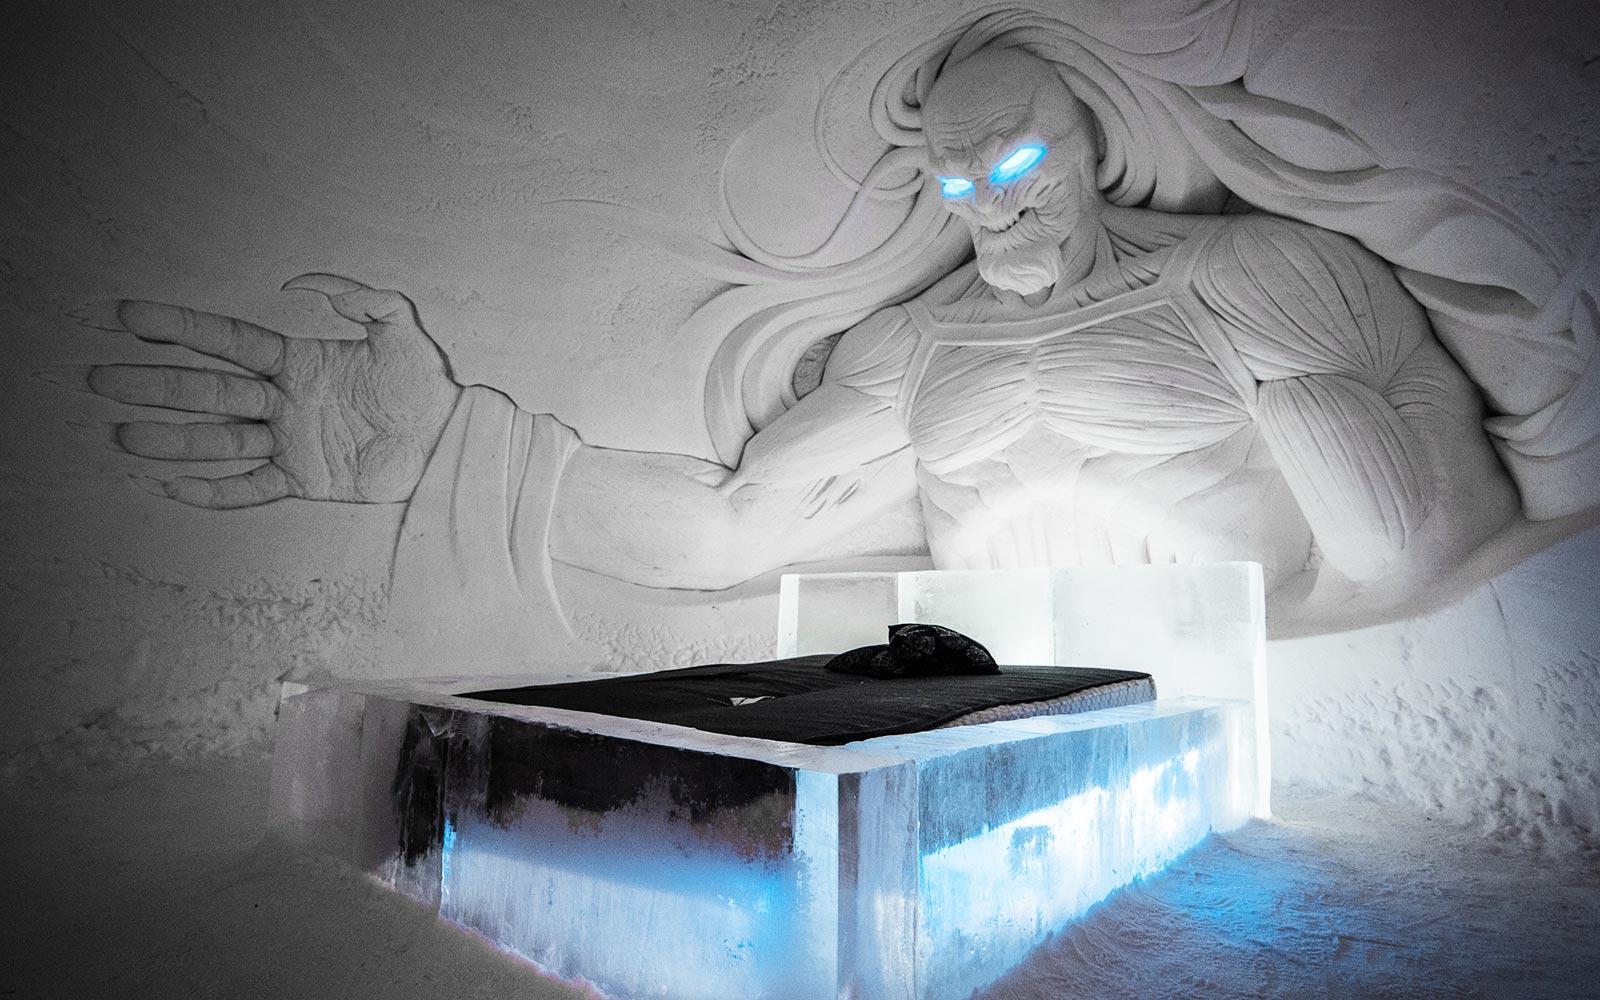 Bedroom Game Of Thrones Ice Hotel Finland Turisticheskoe Agentstvo El Medano Tour Harkov Turisticheskoe Agentstvo El Medano Tur Harkov